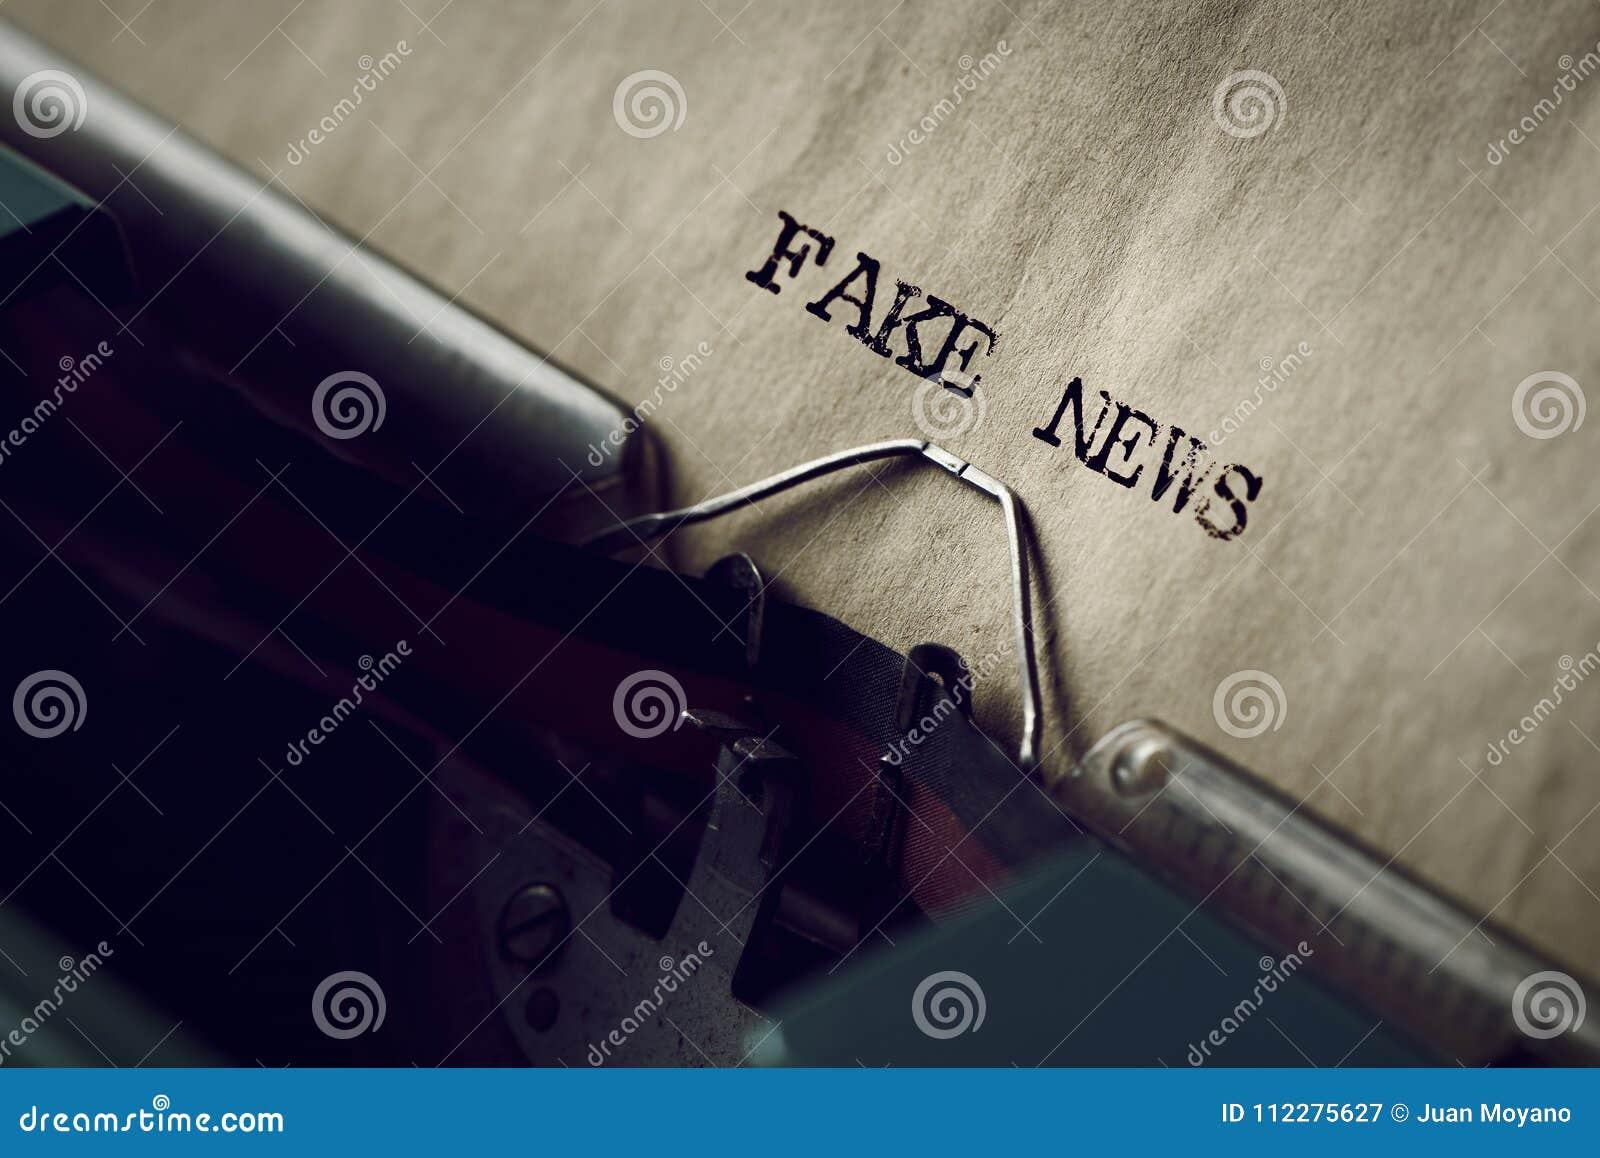 Text fake news written with a typewriter